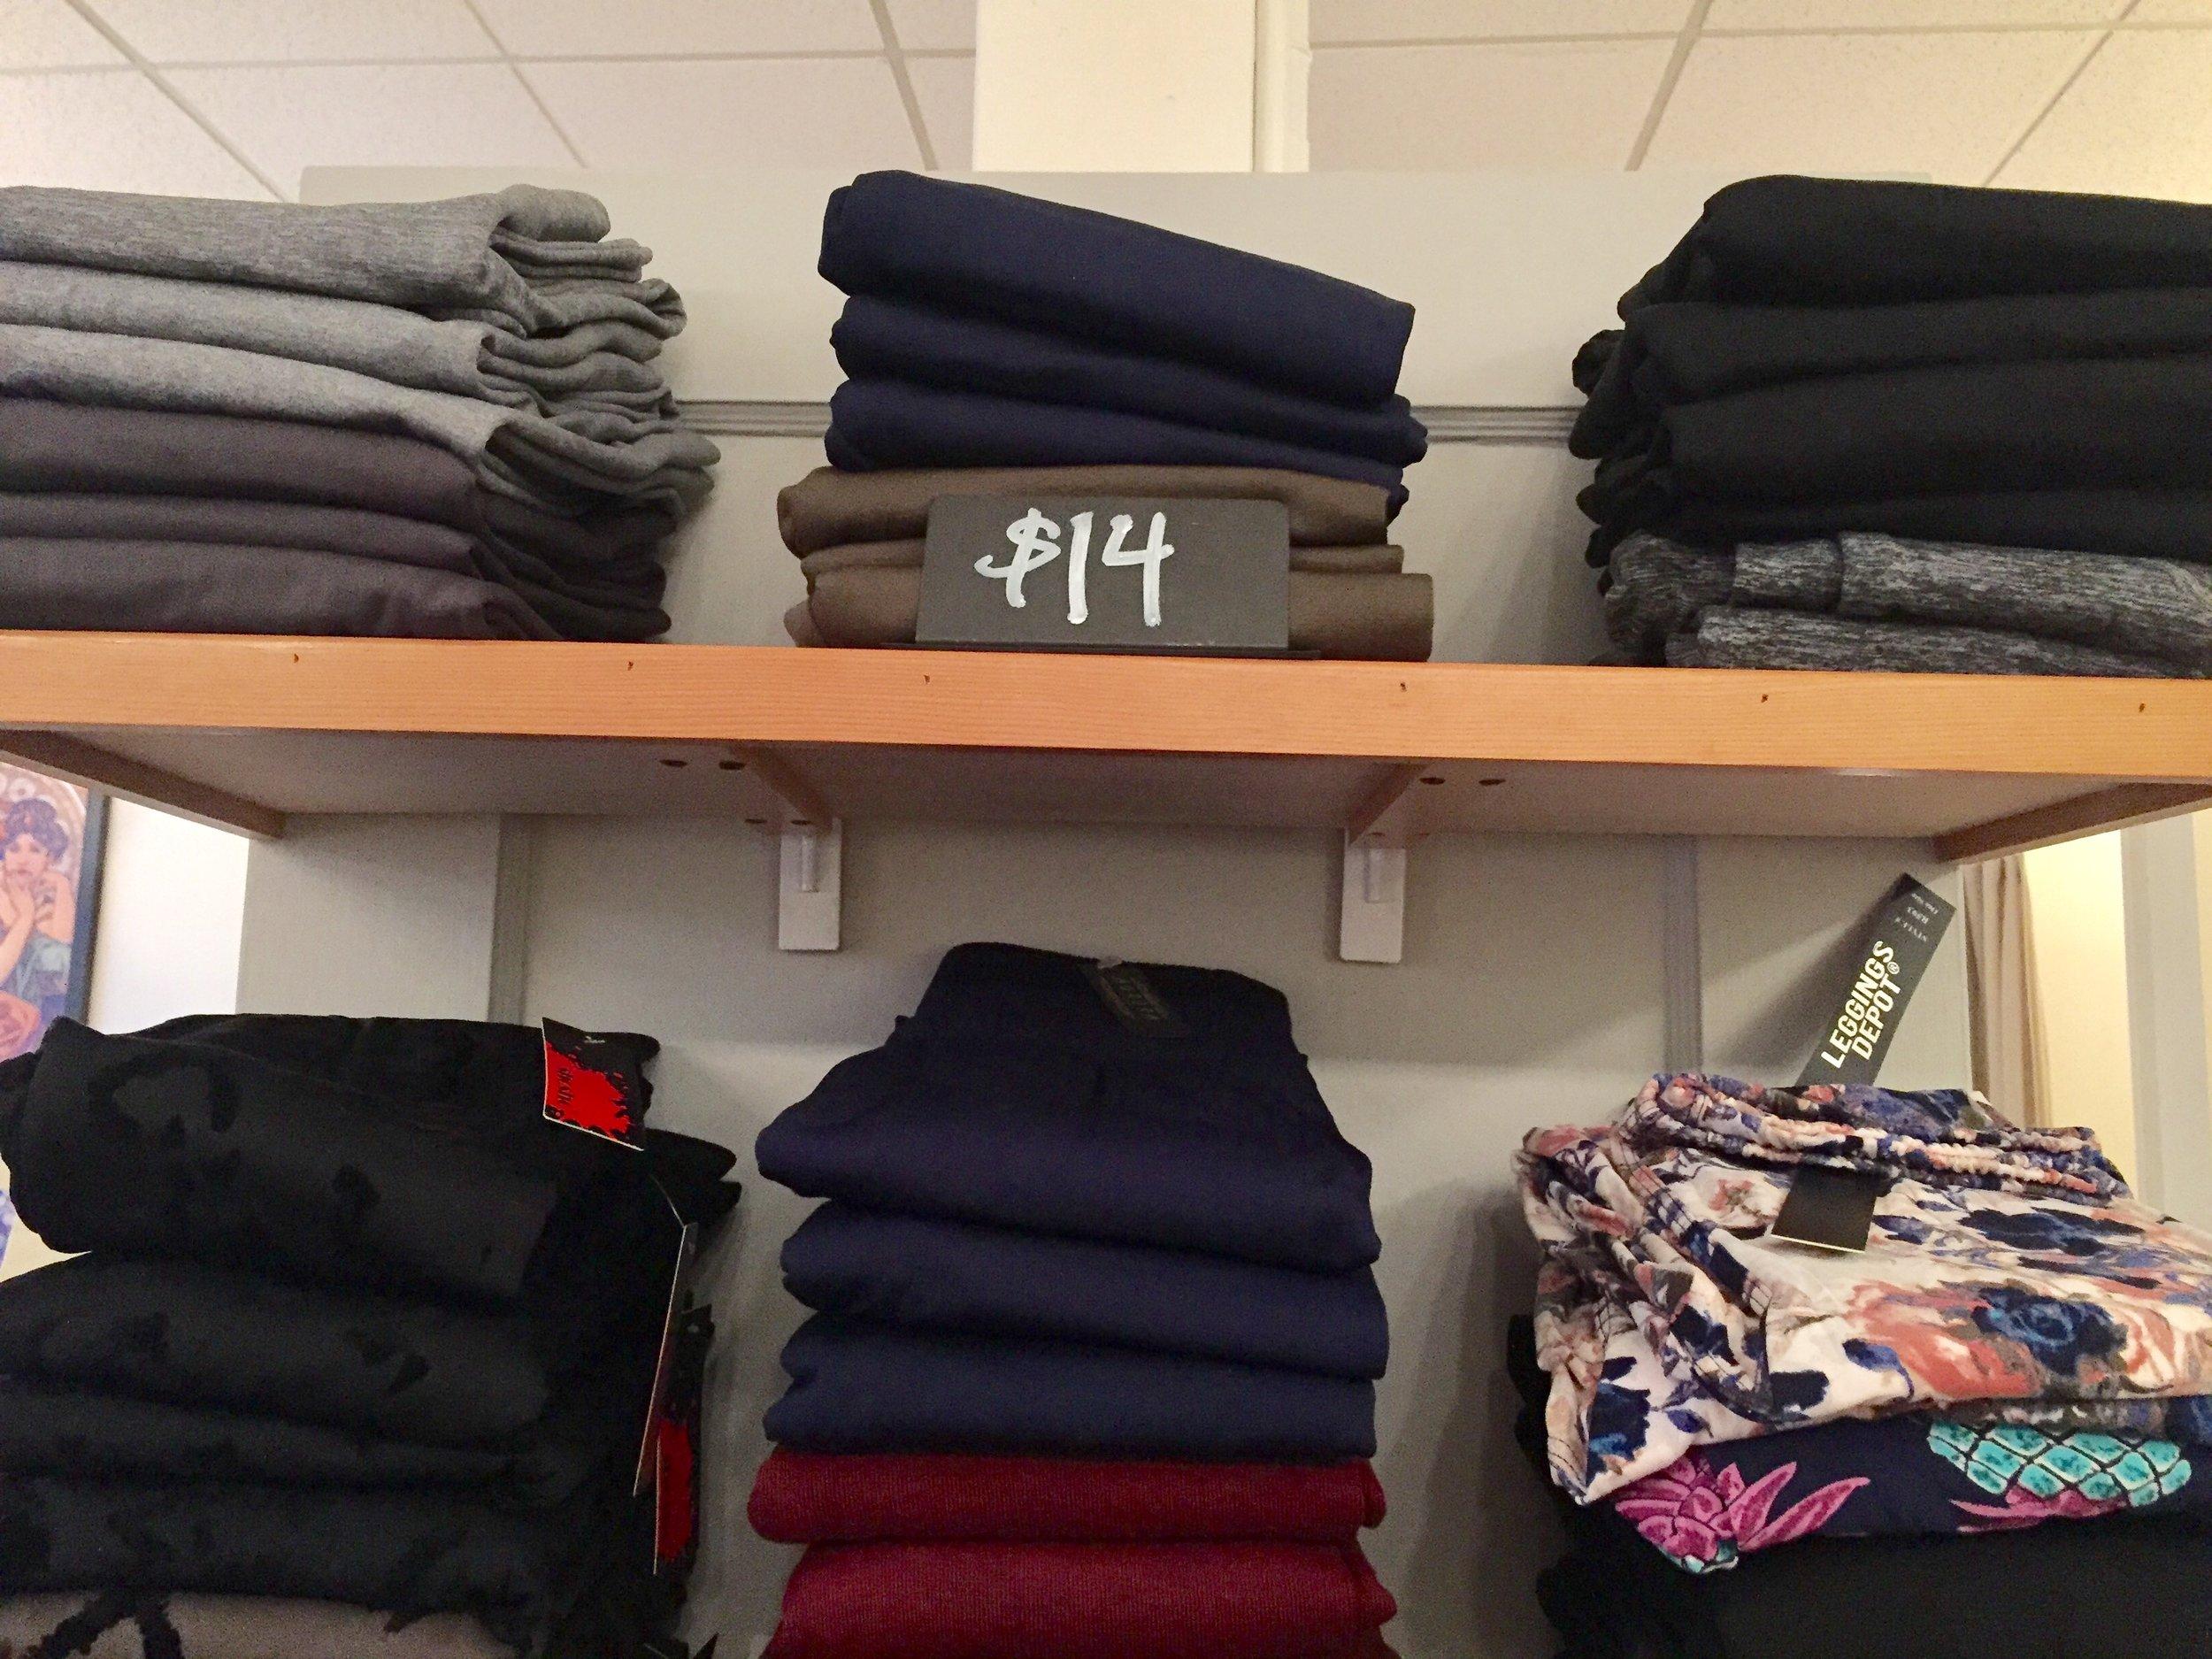 Leggings: Basic, Knit, Print, High-waisted ($14)